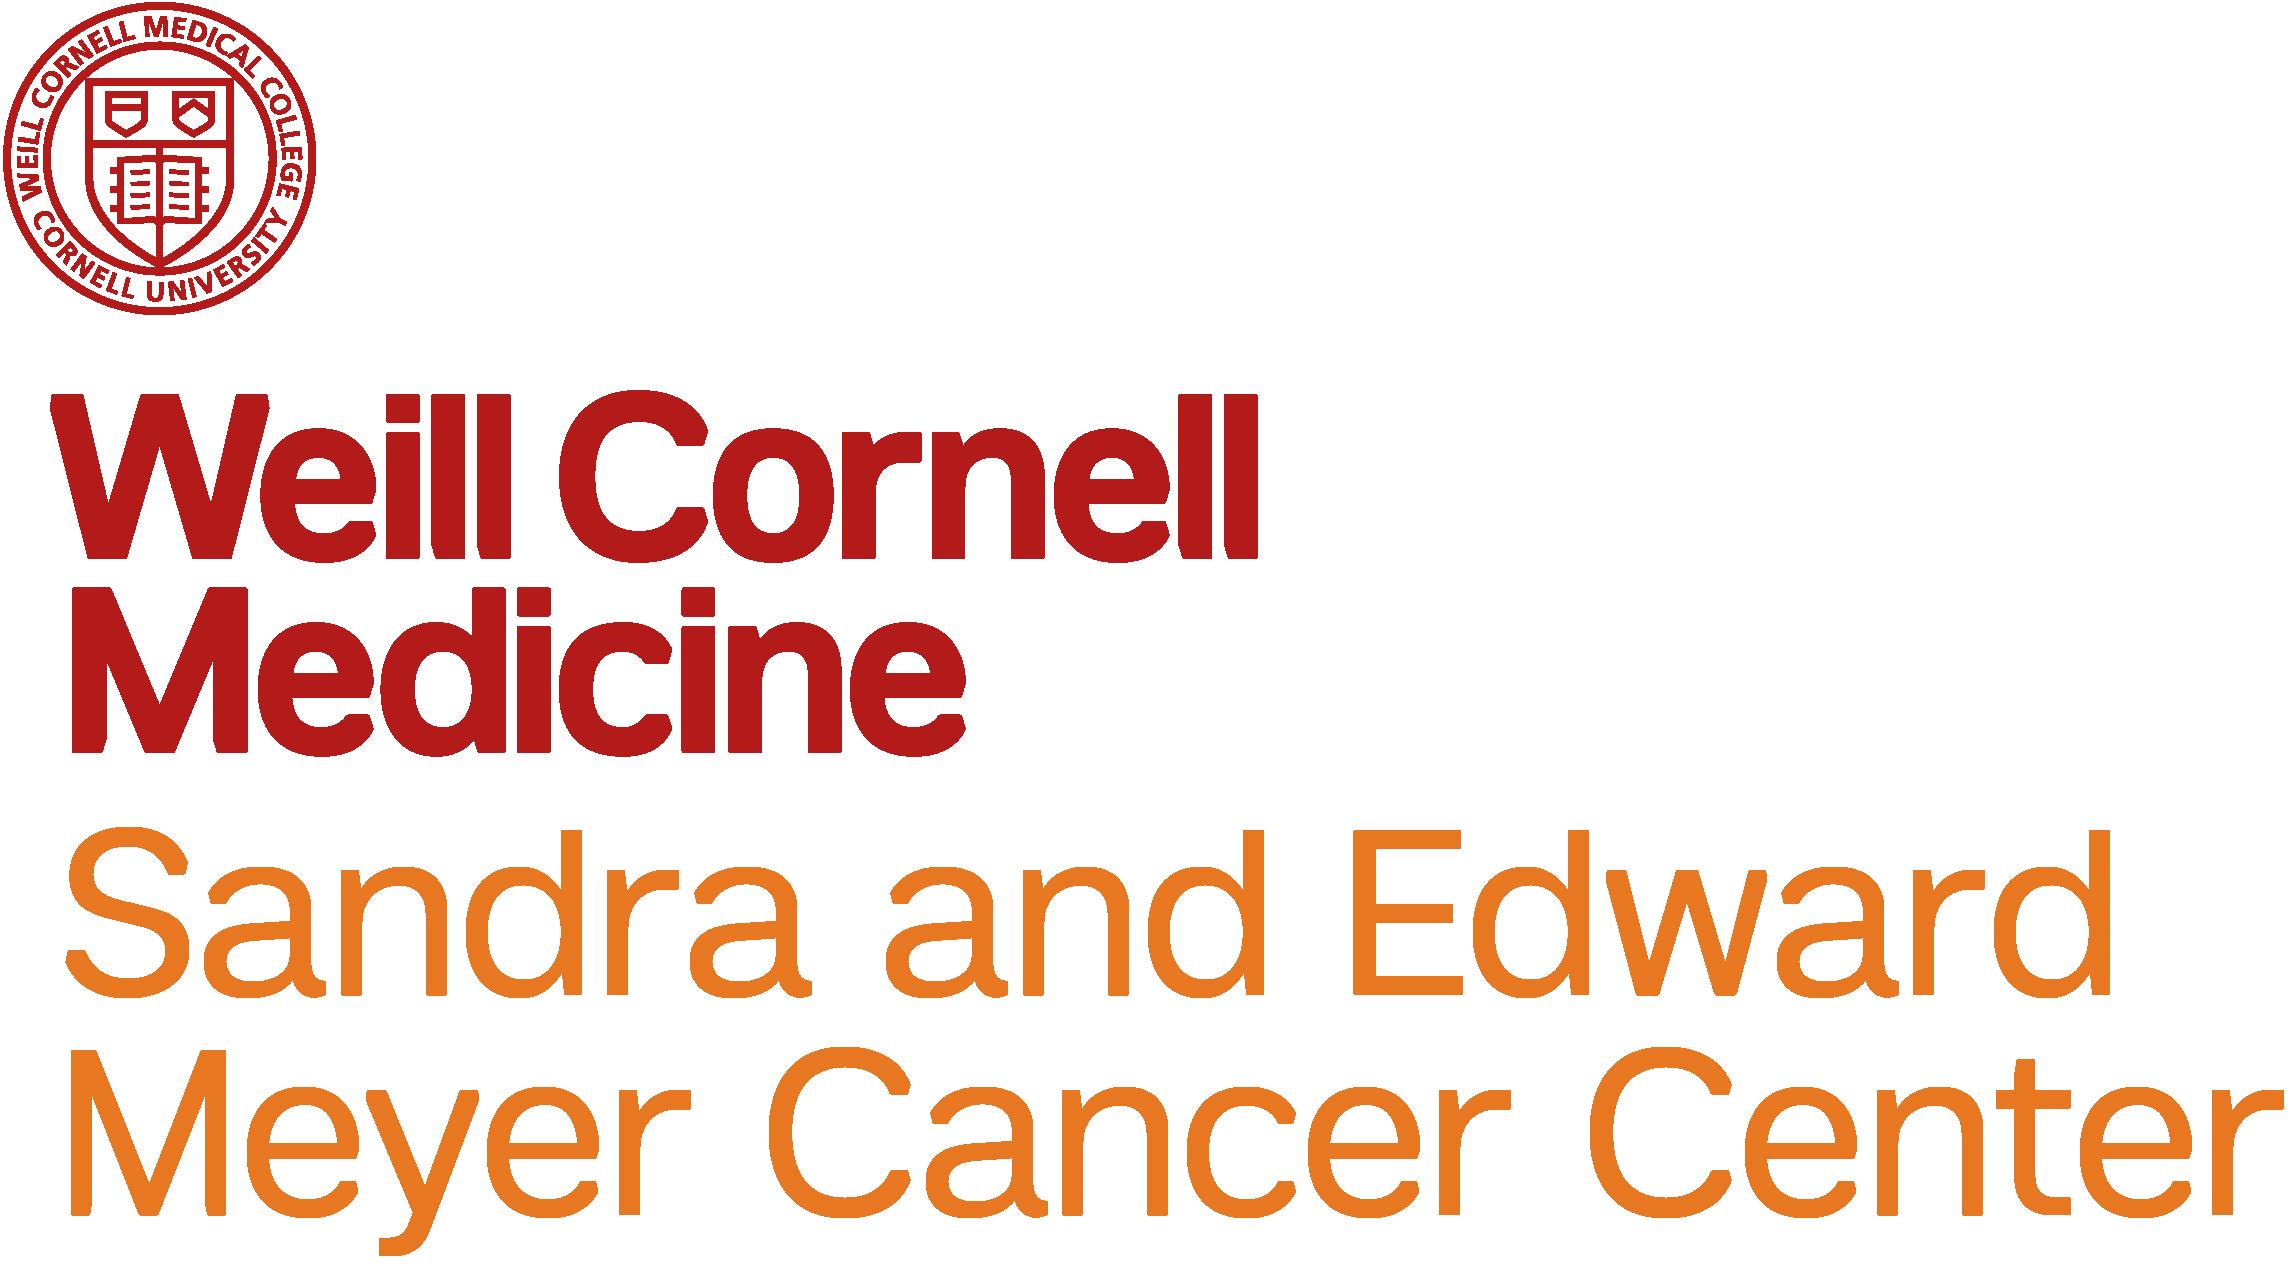 Meyer Cancer Center Long Name